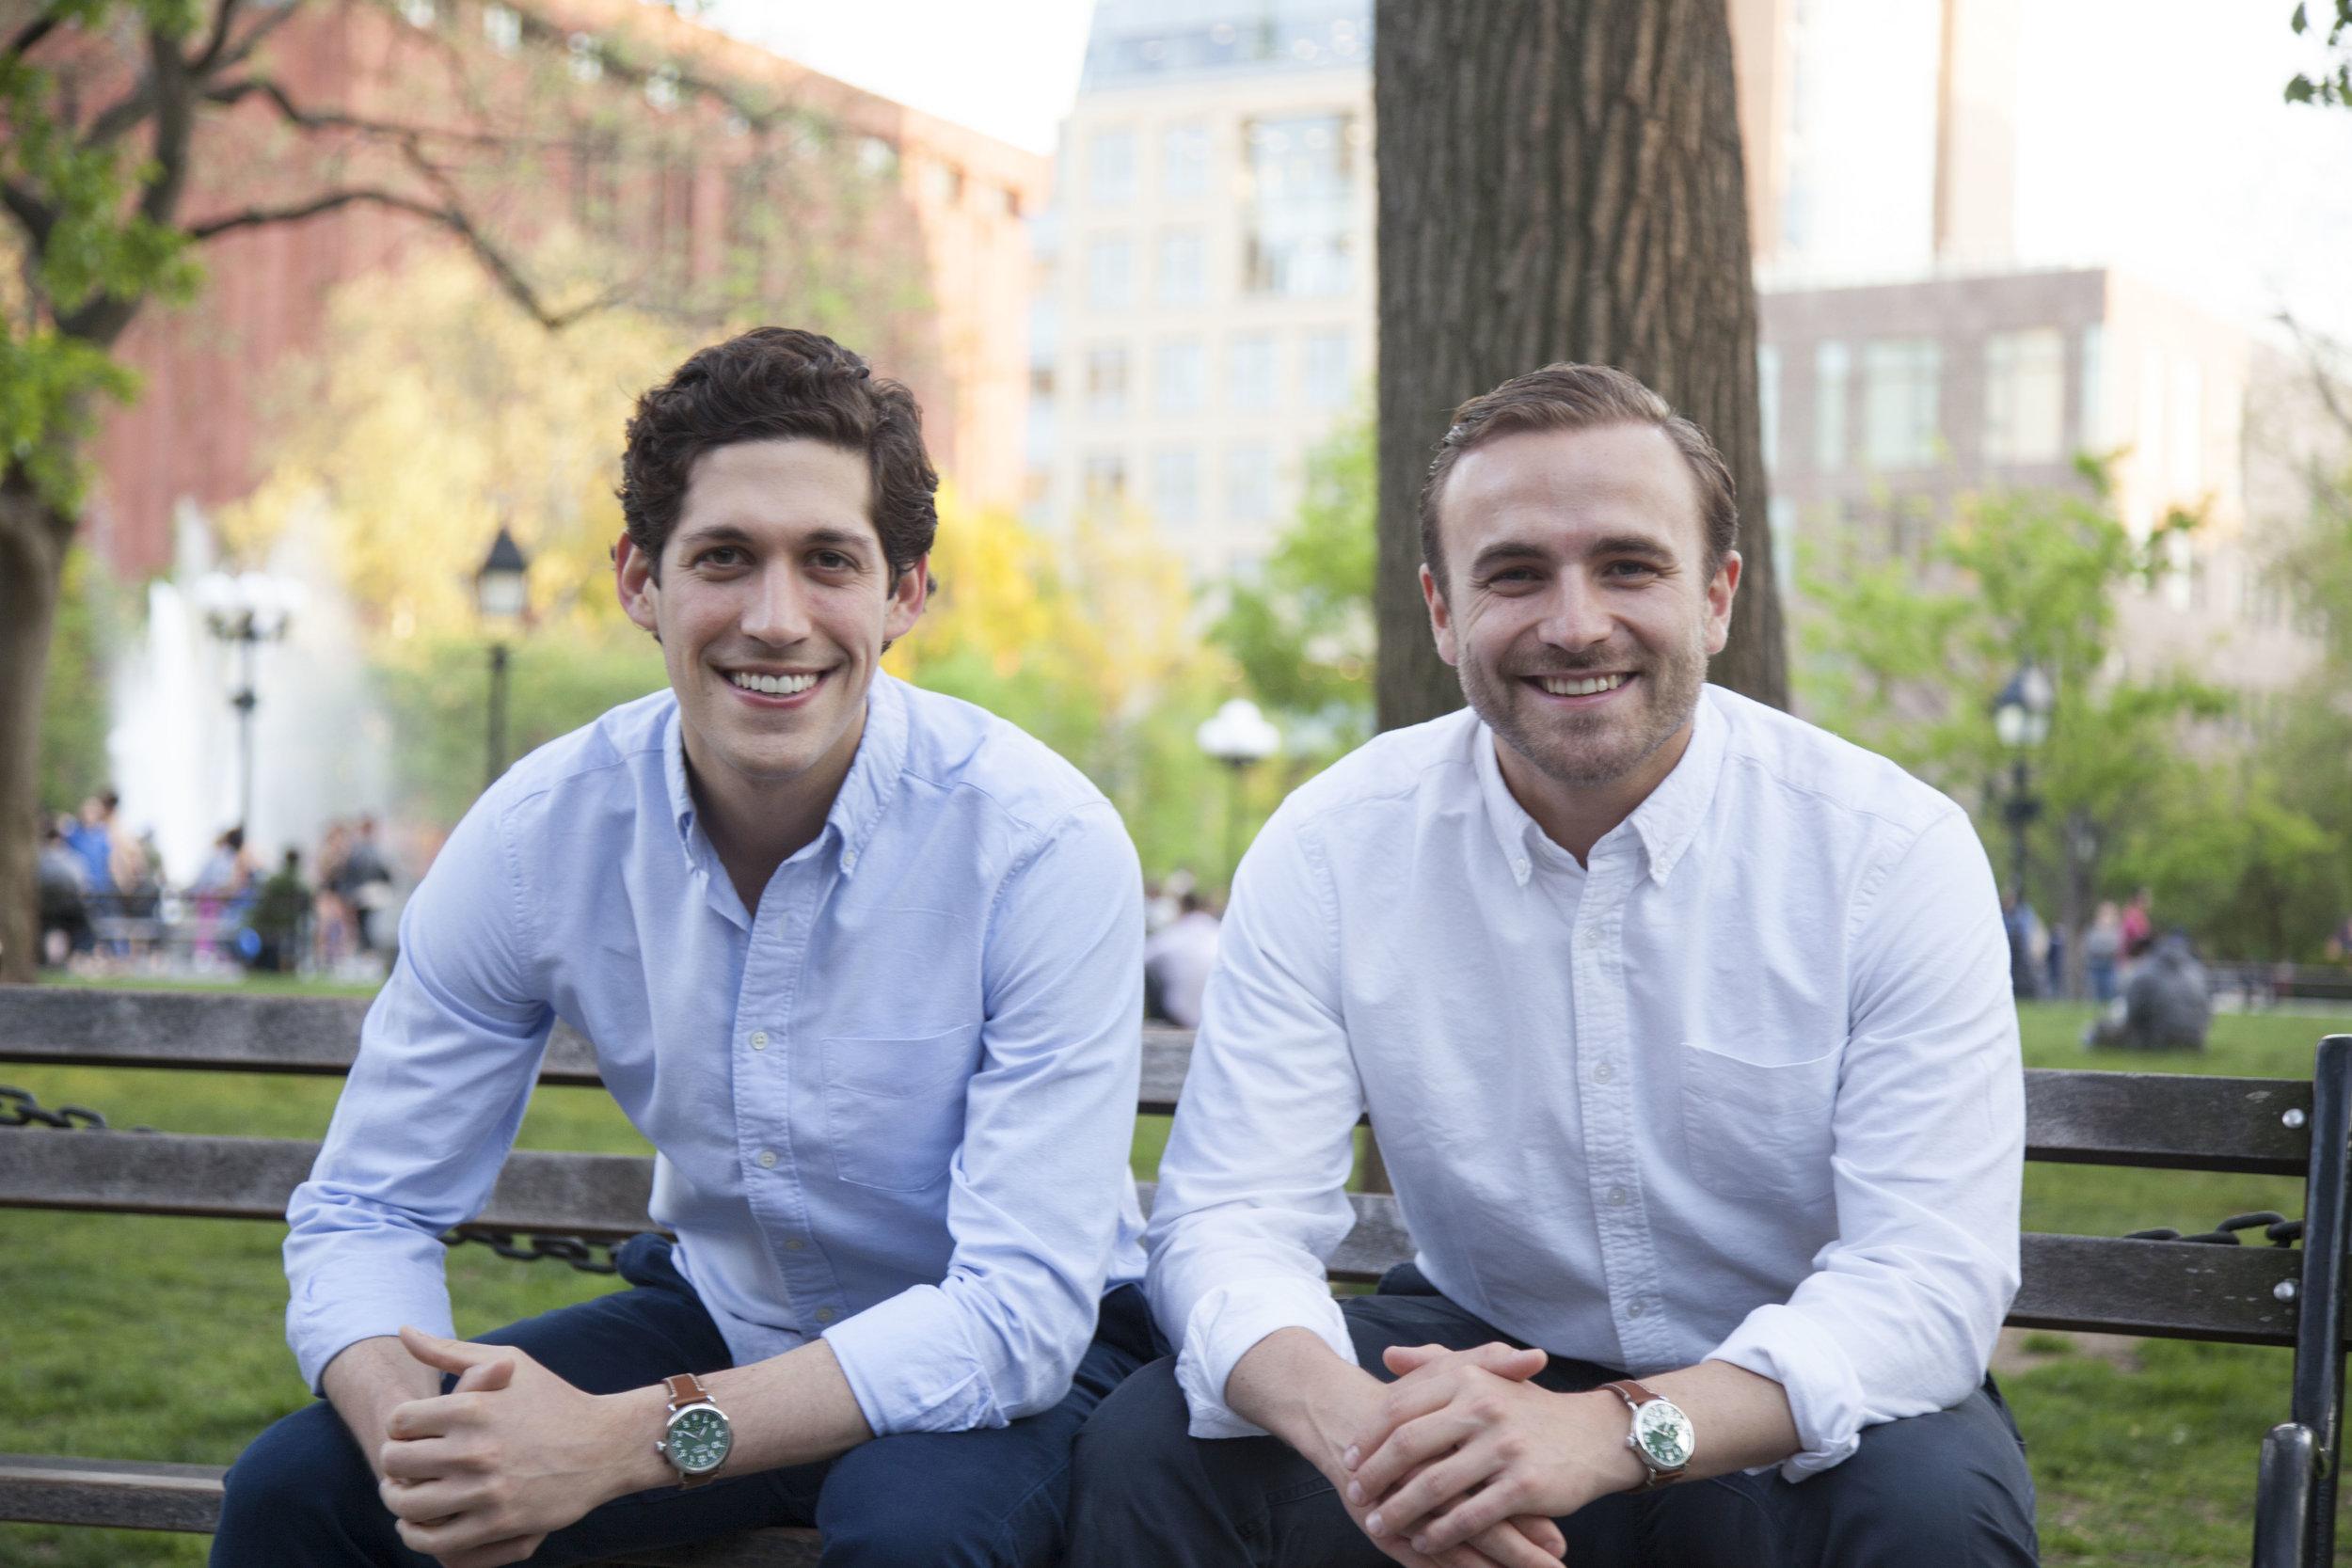 Nick Martell and Jack Kramer, Co-Founders of MarketSnacks